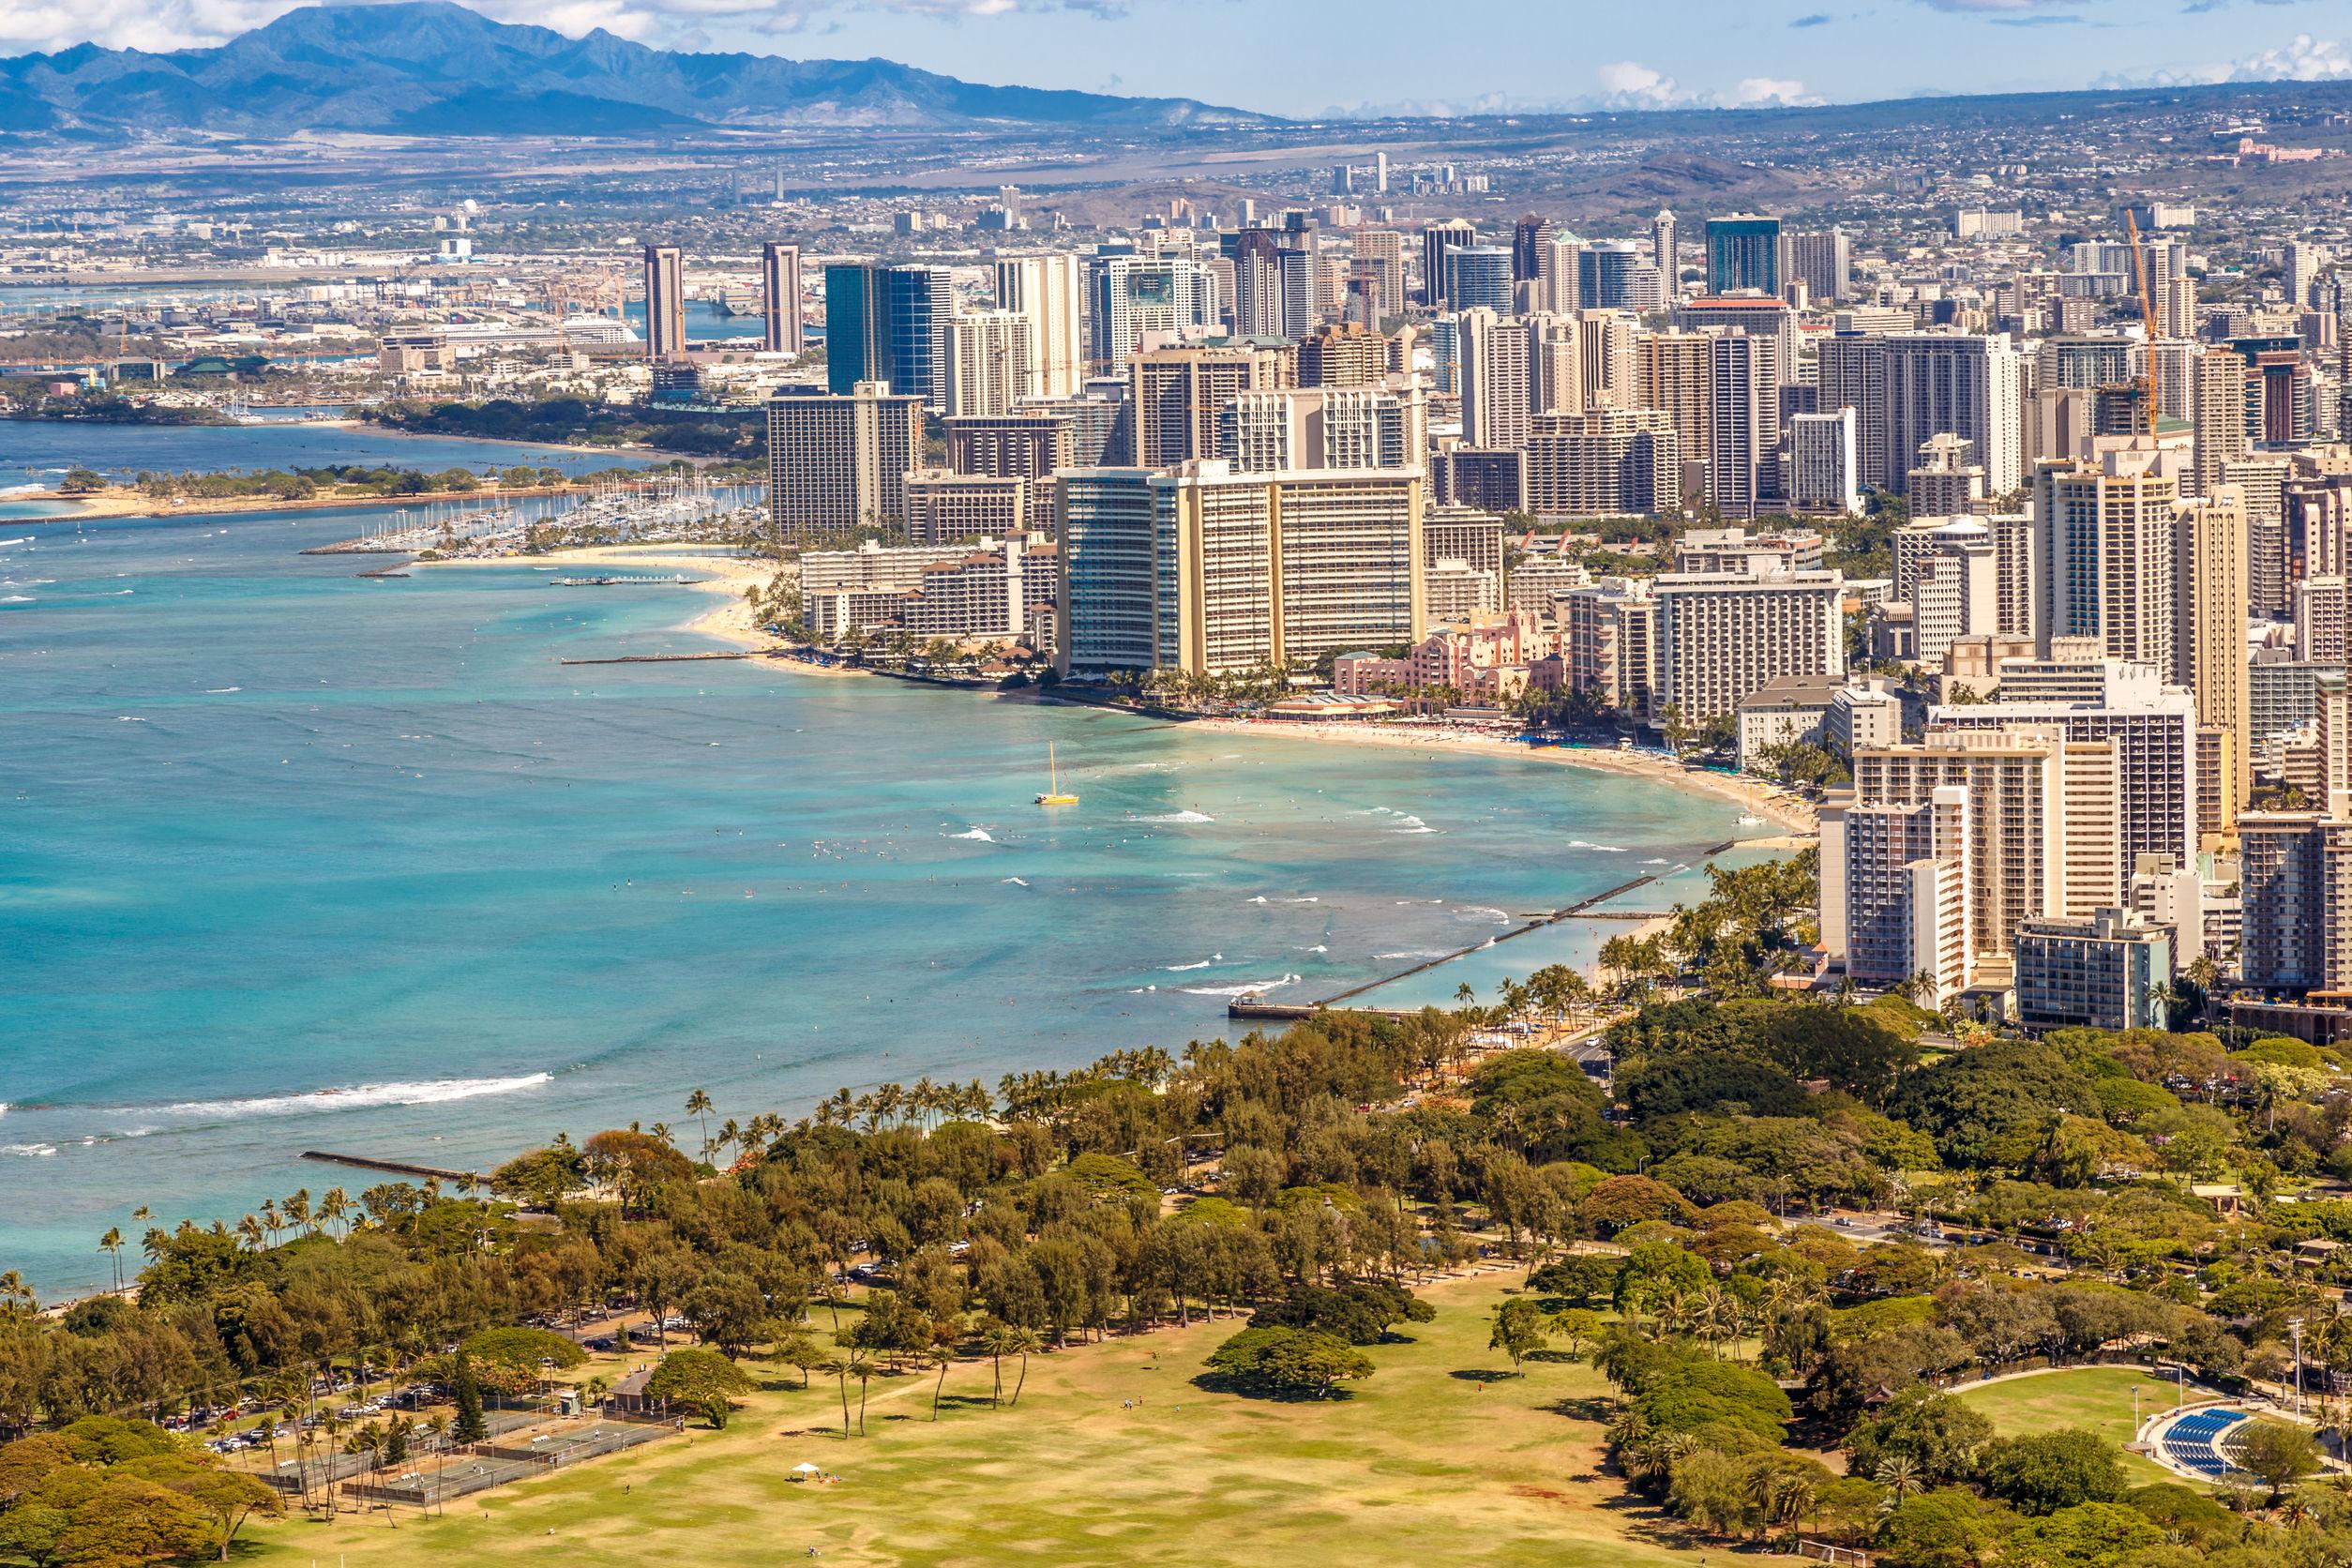 Honolulu Cruise Ship Injury Lawyer